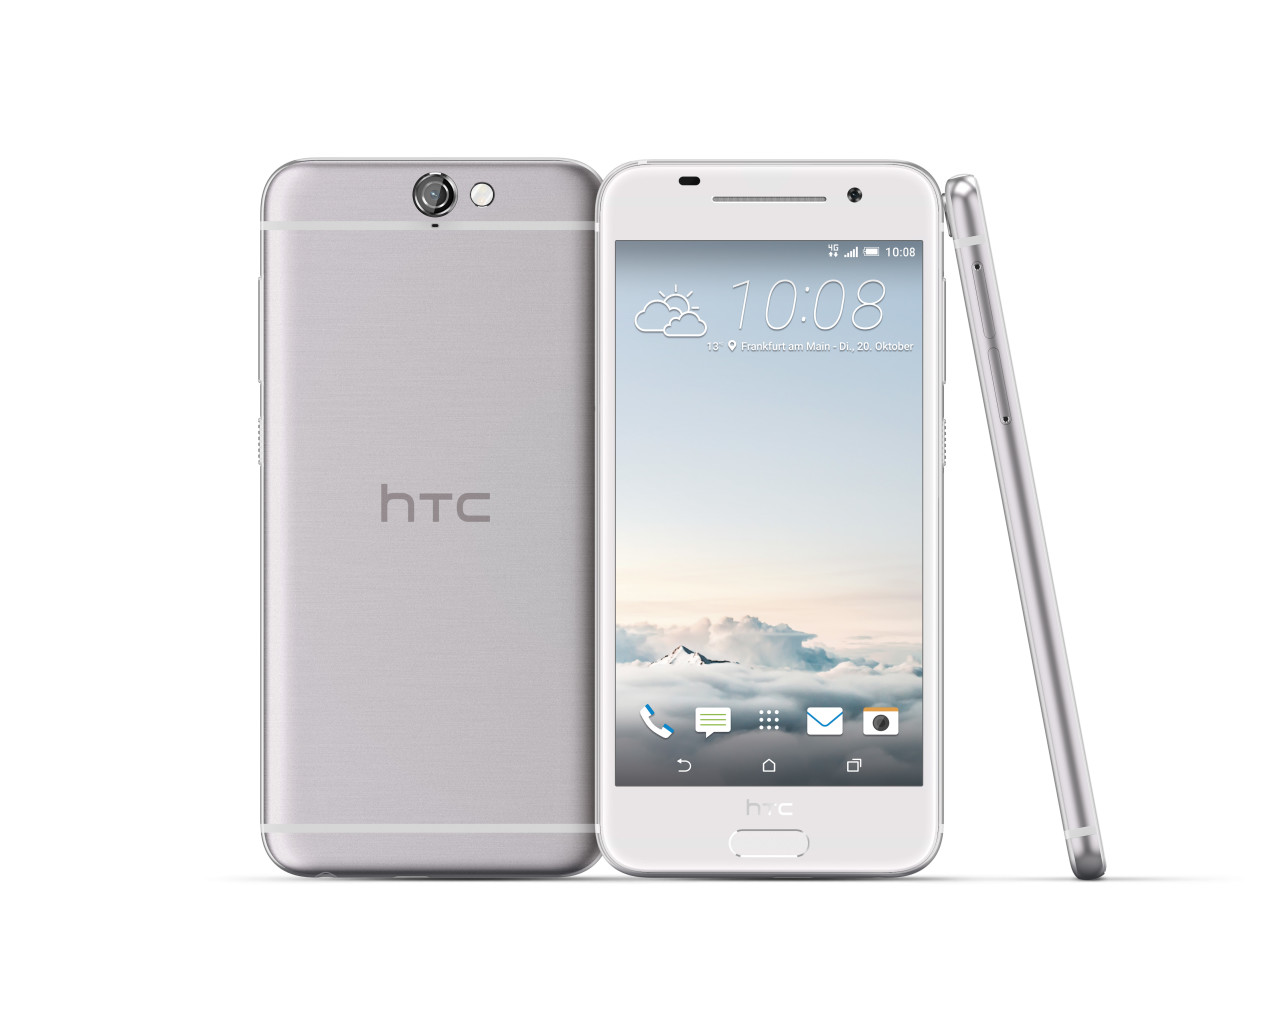 HTC-One-A9_Aero_3V_OpalSilver-1280x1010